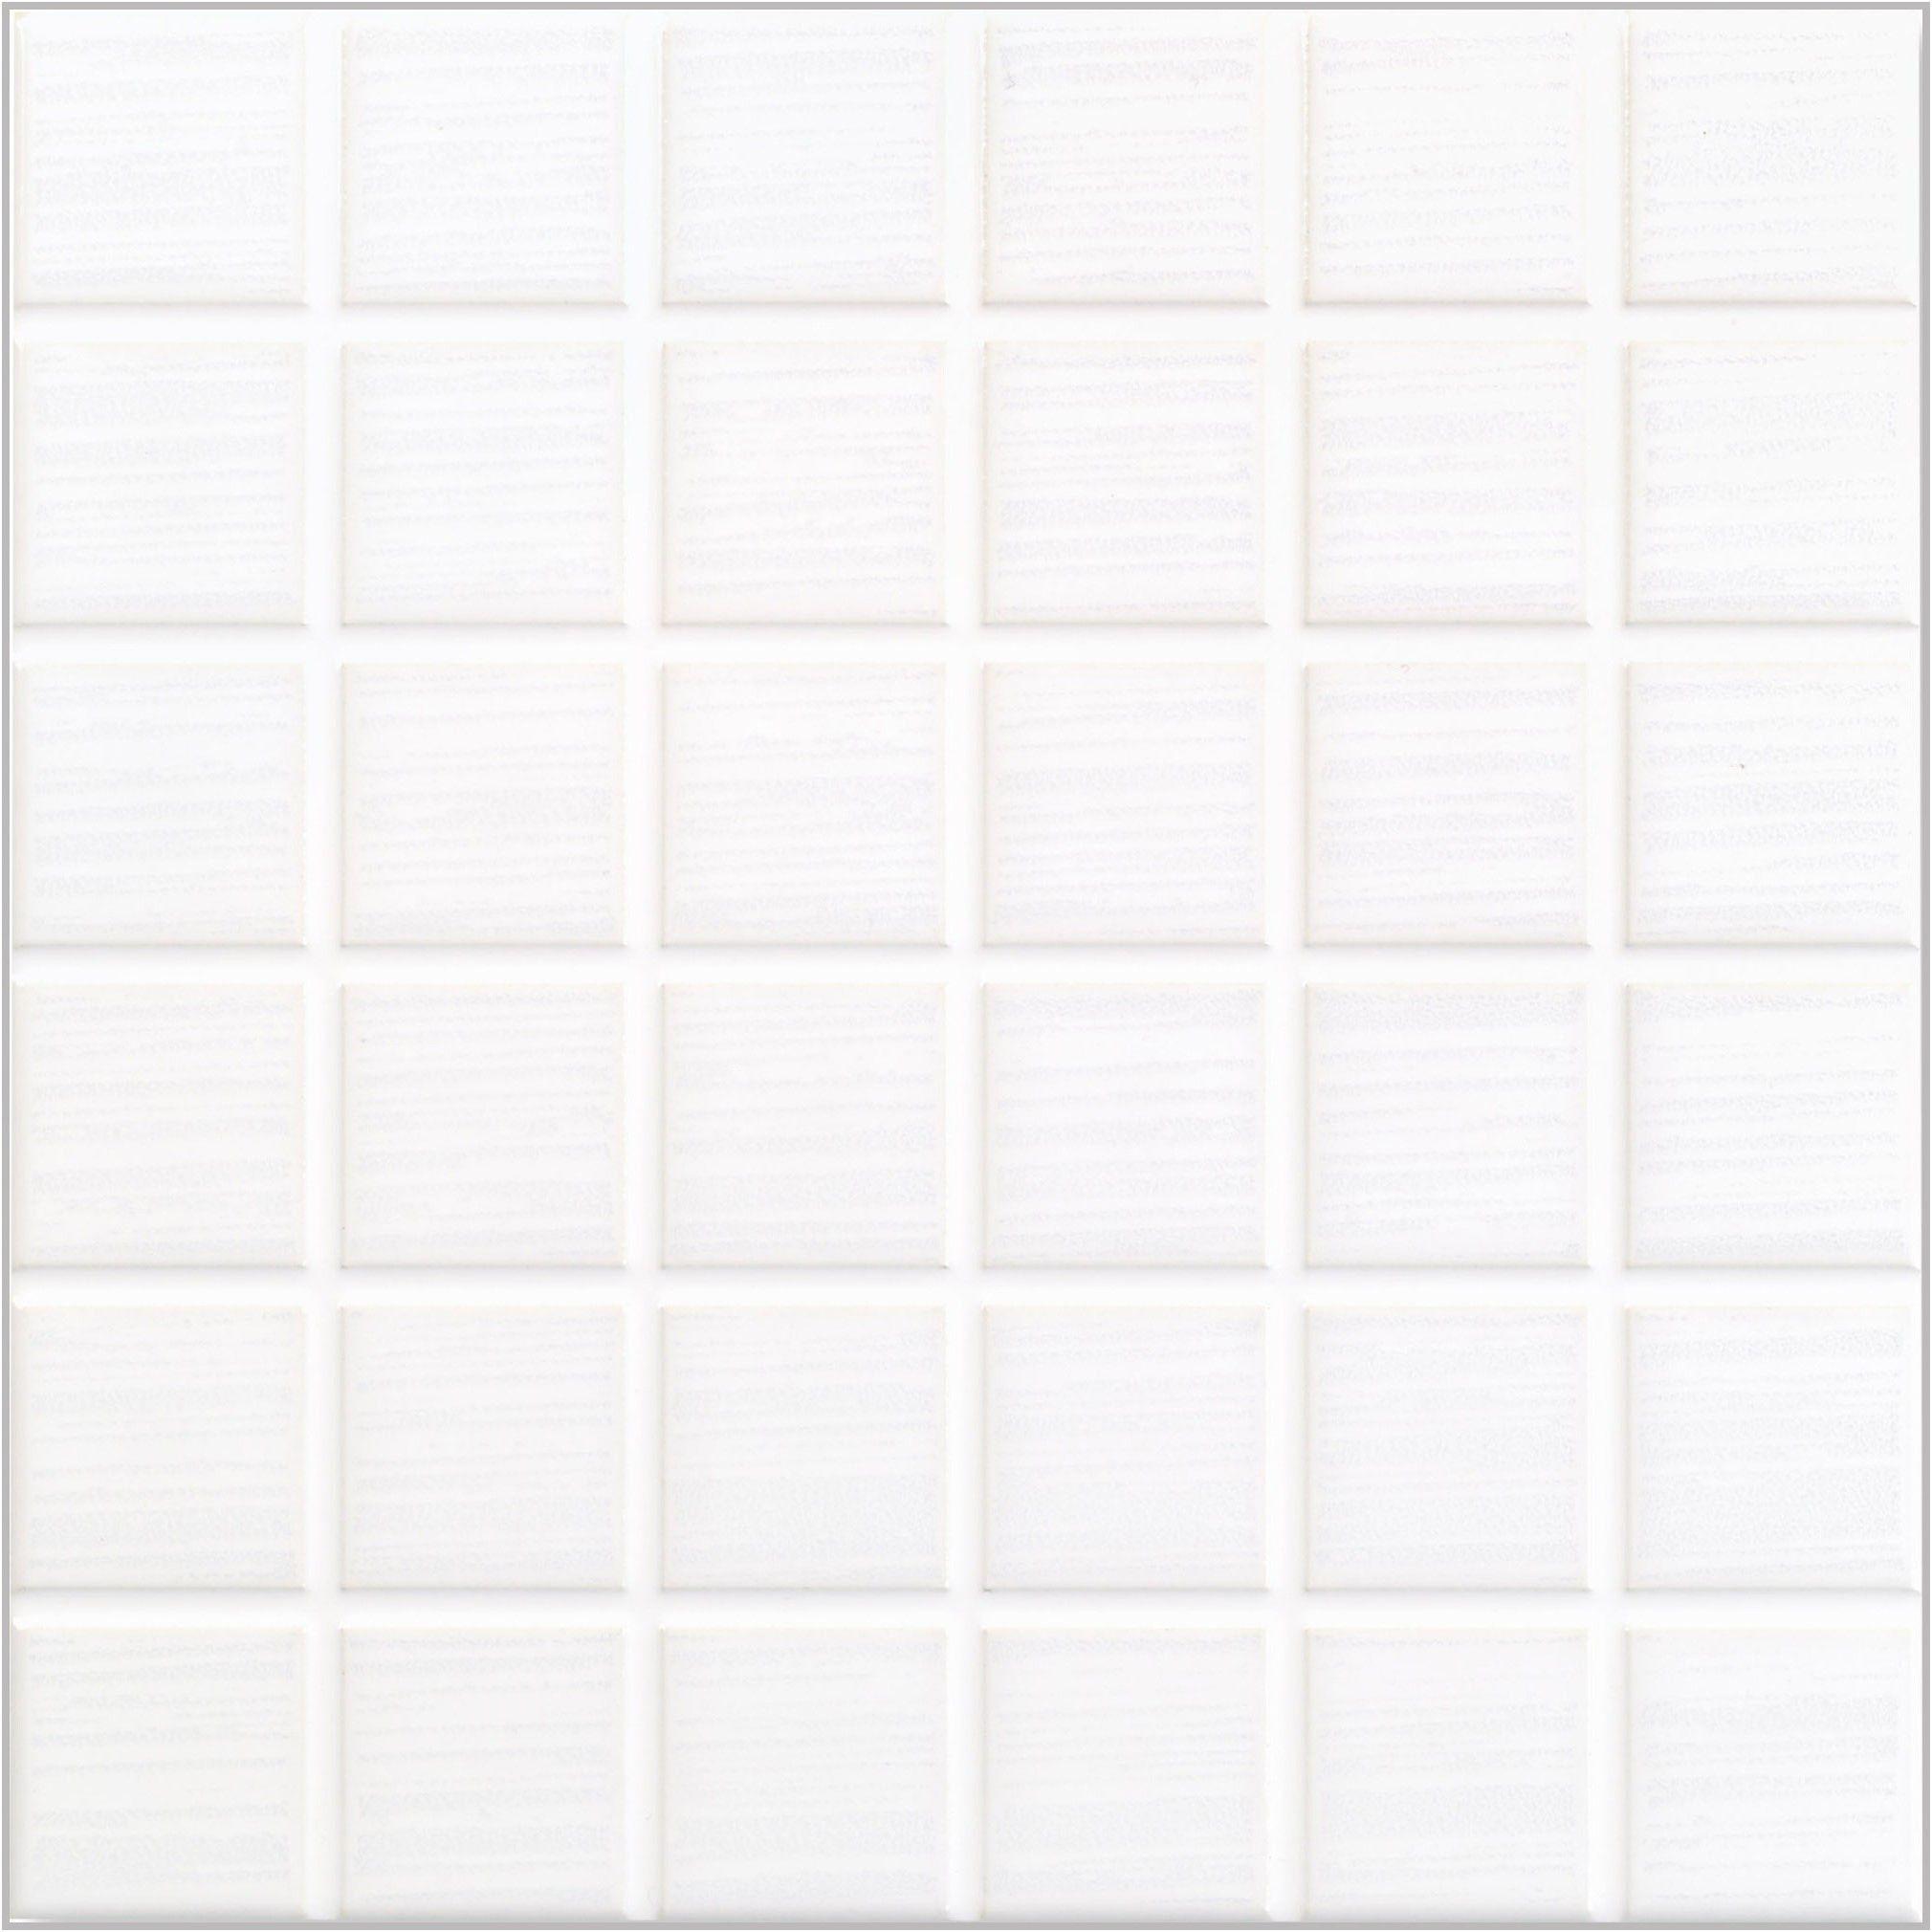 Bathroom Floor Tile Texture Black Bathroom Wall Tiles Texture From White Textured Bathroom Tiles